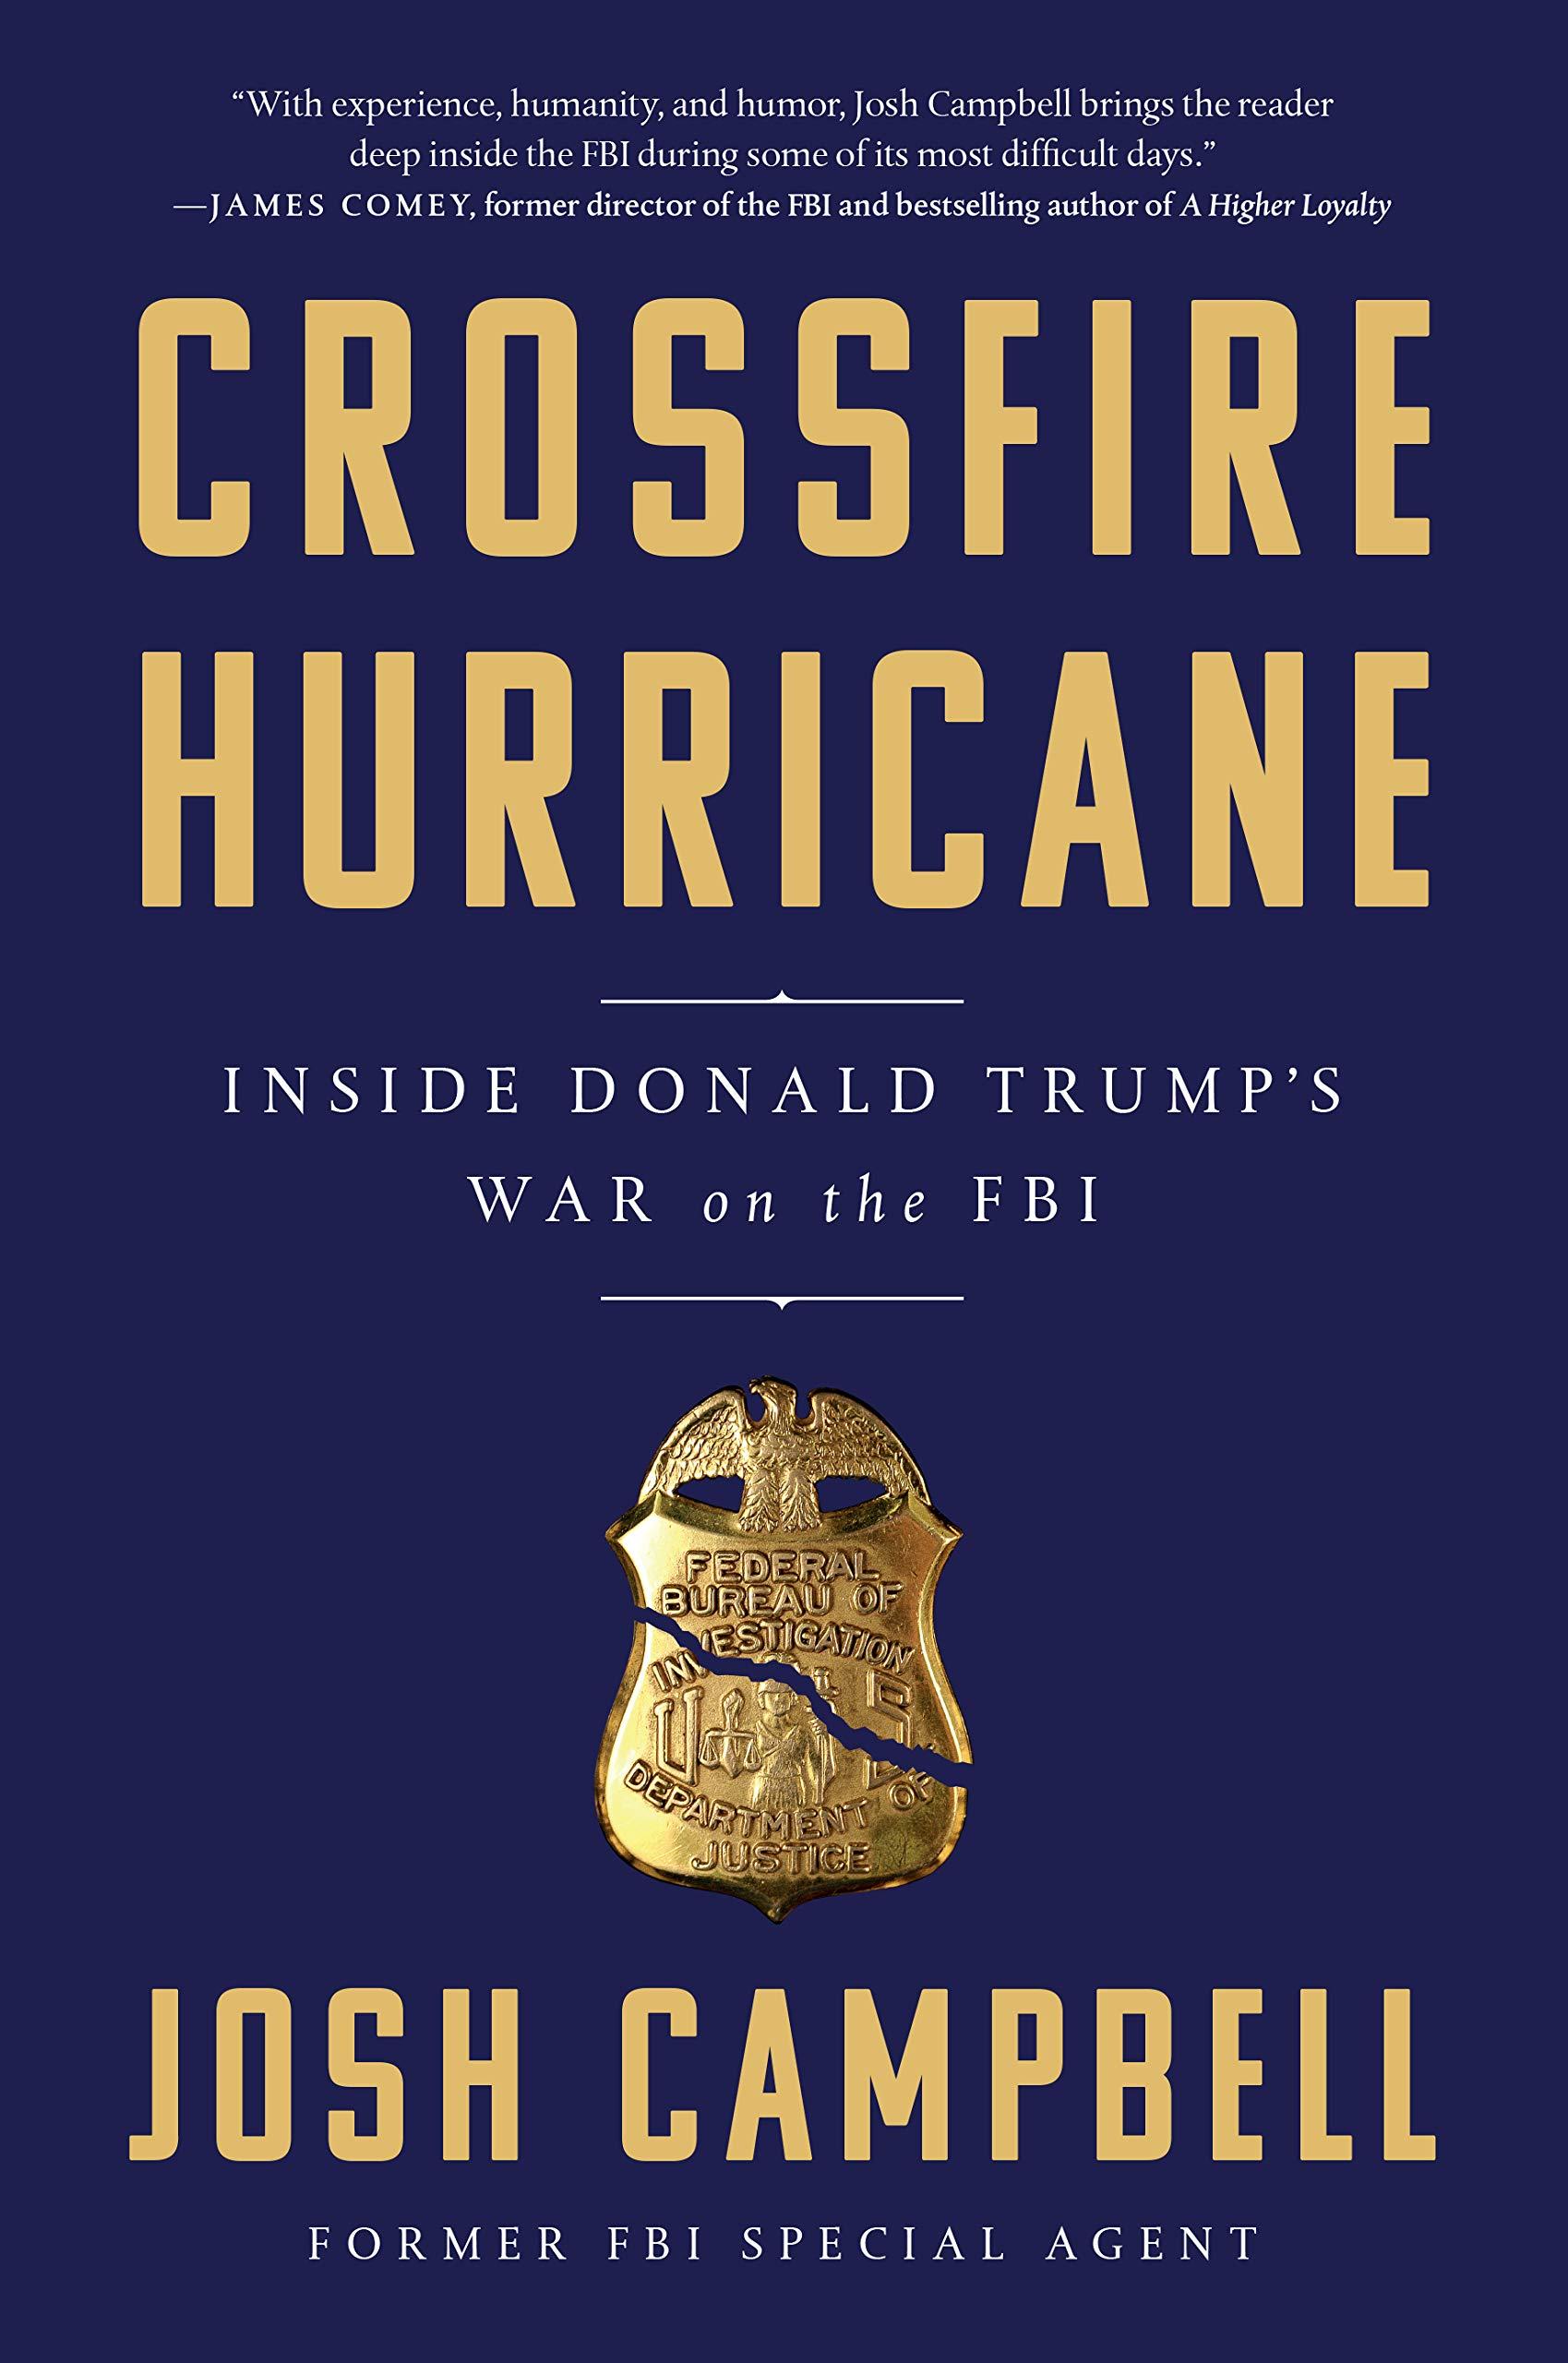 Crossfire Hurricane: Inside Donald Trump's War on the FBI by Algonquin Books